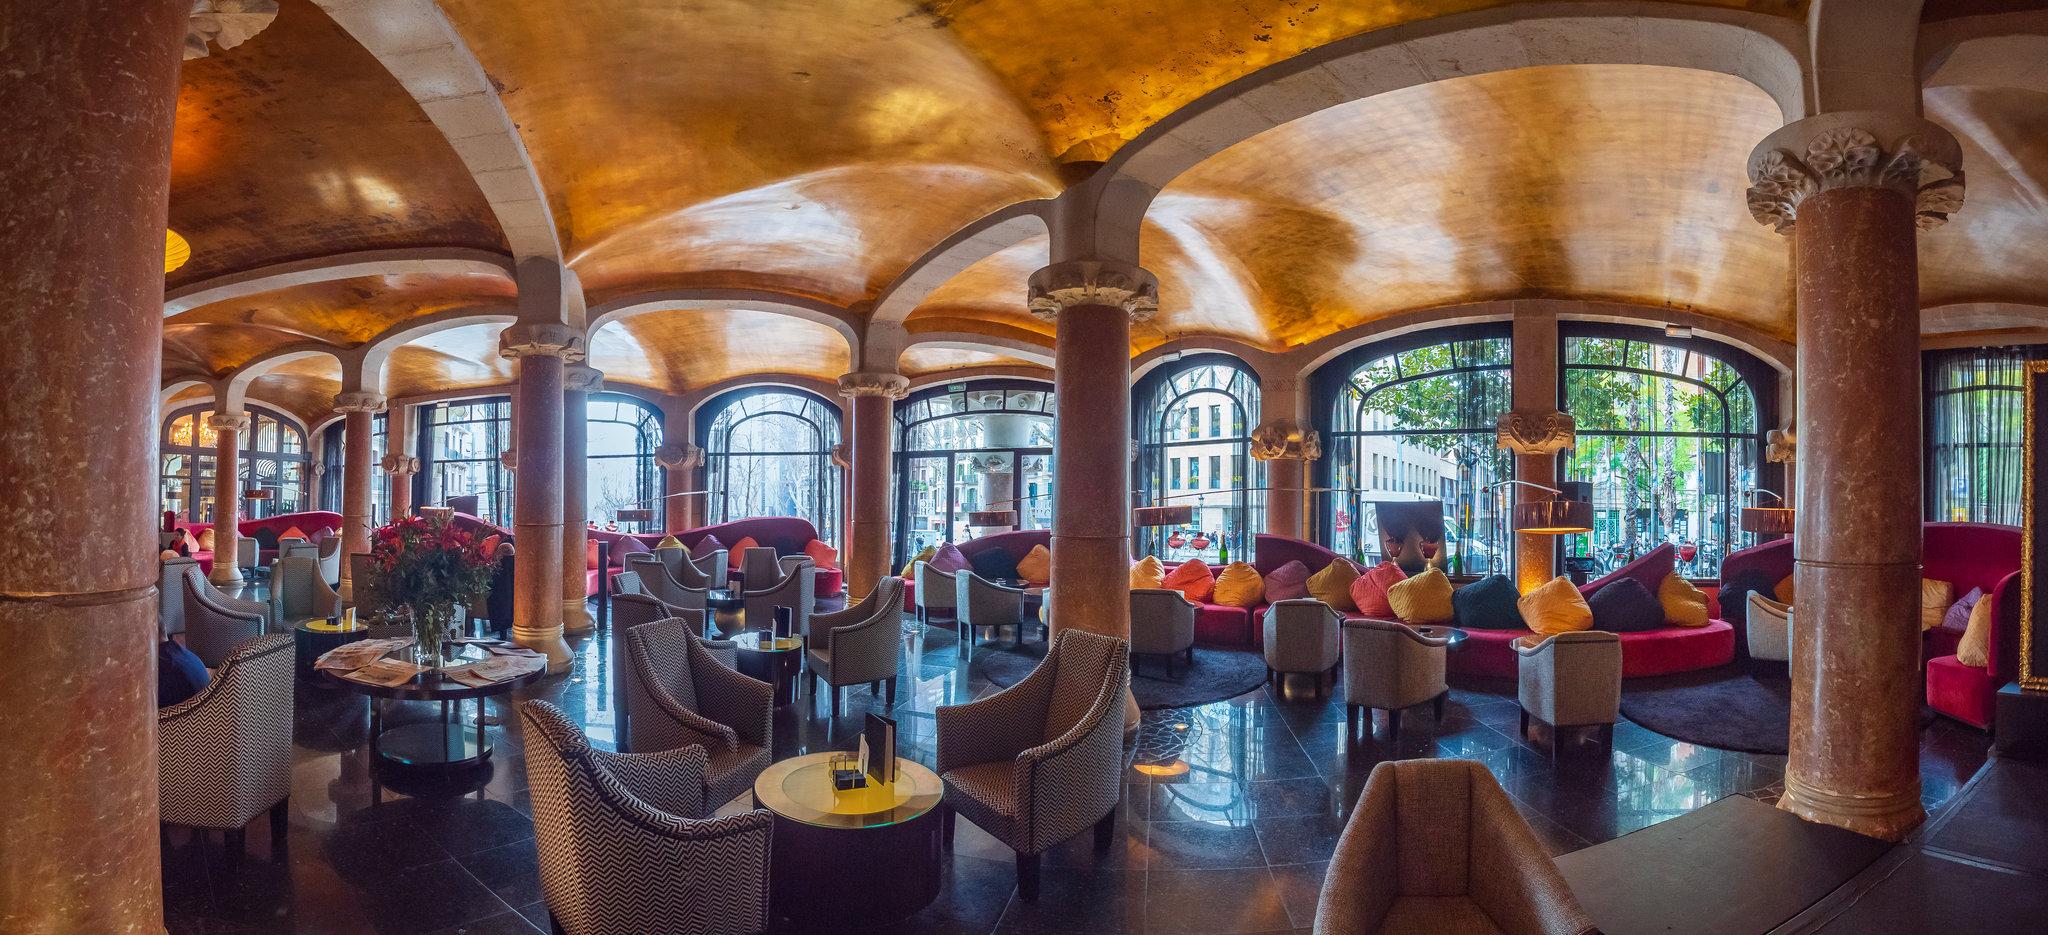 Hotel Casa Fuster Deluxe Barcelona Spain Hotels Gds